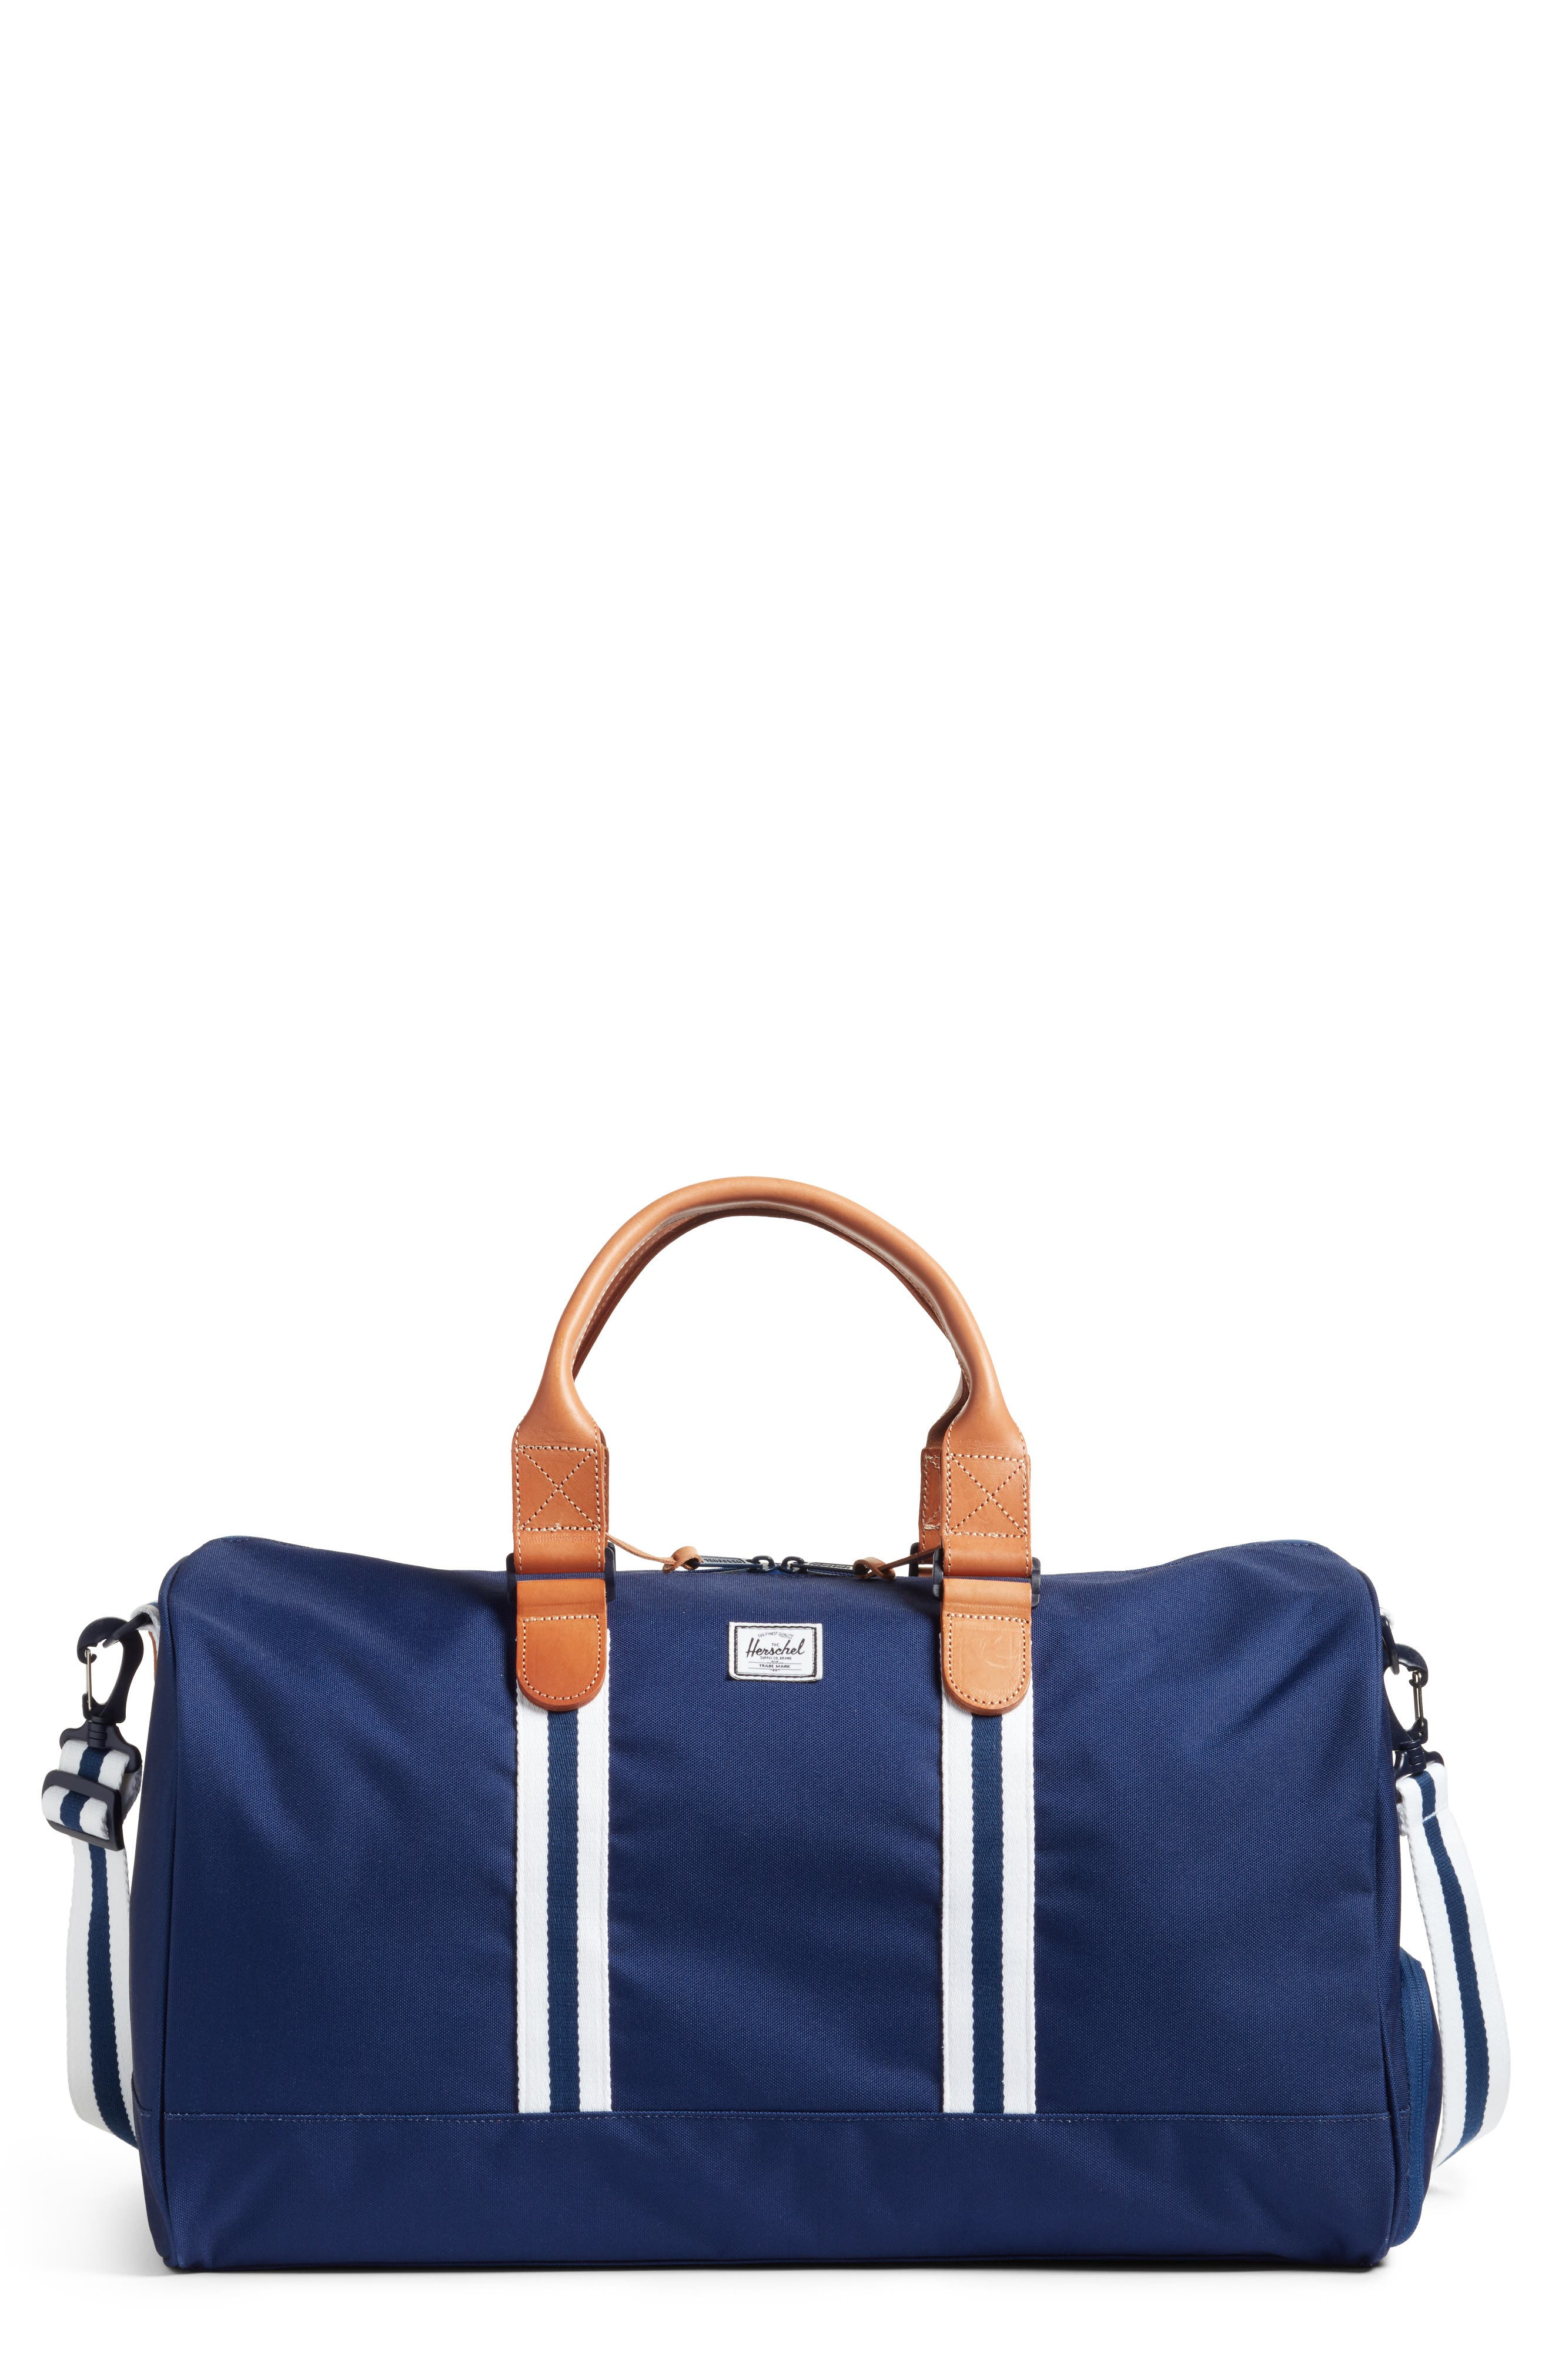 Novel Duffel Bag,                         Main,                         color, Blue Depths